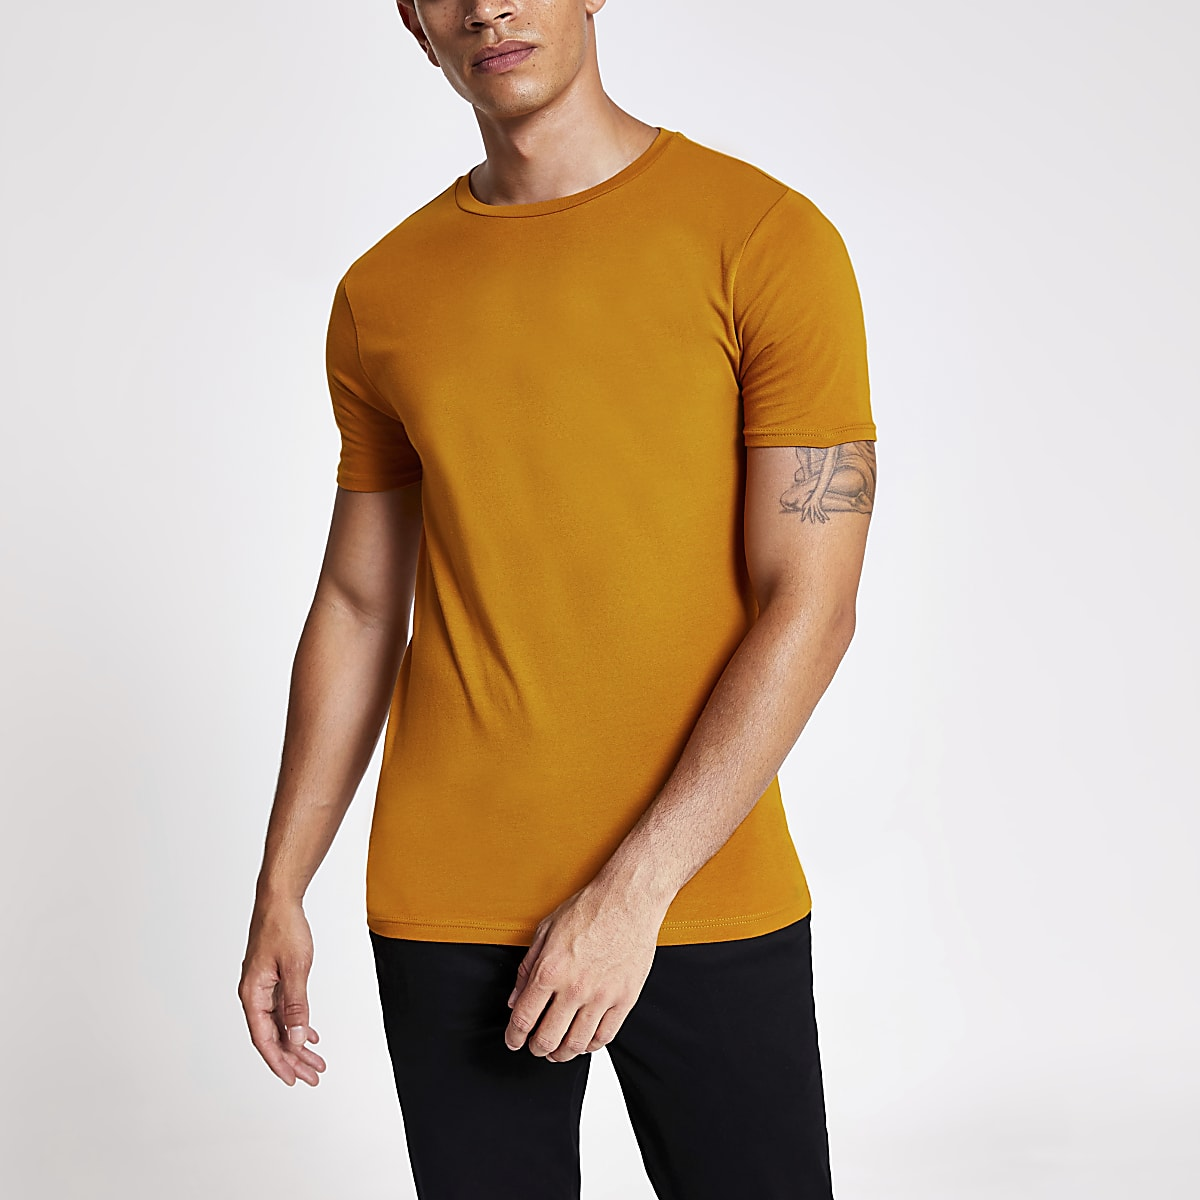 Orange muscle fit short sleeve T-shirt